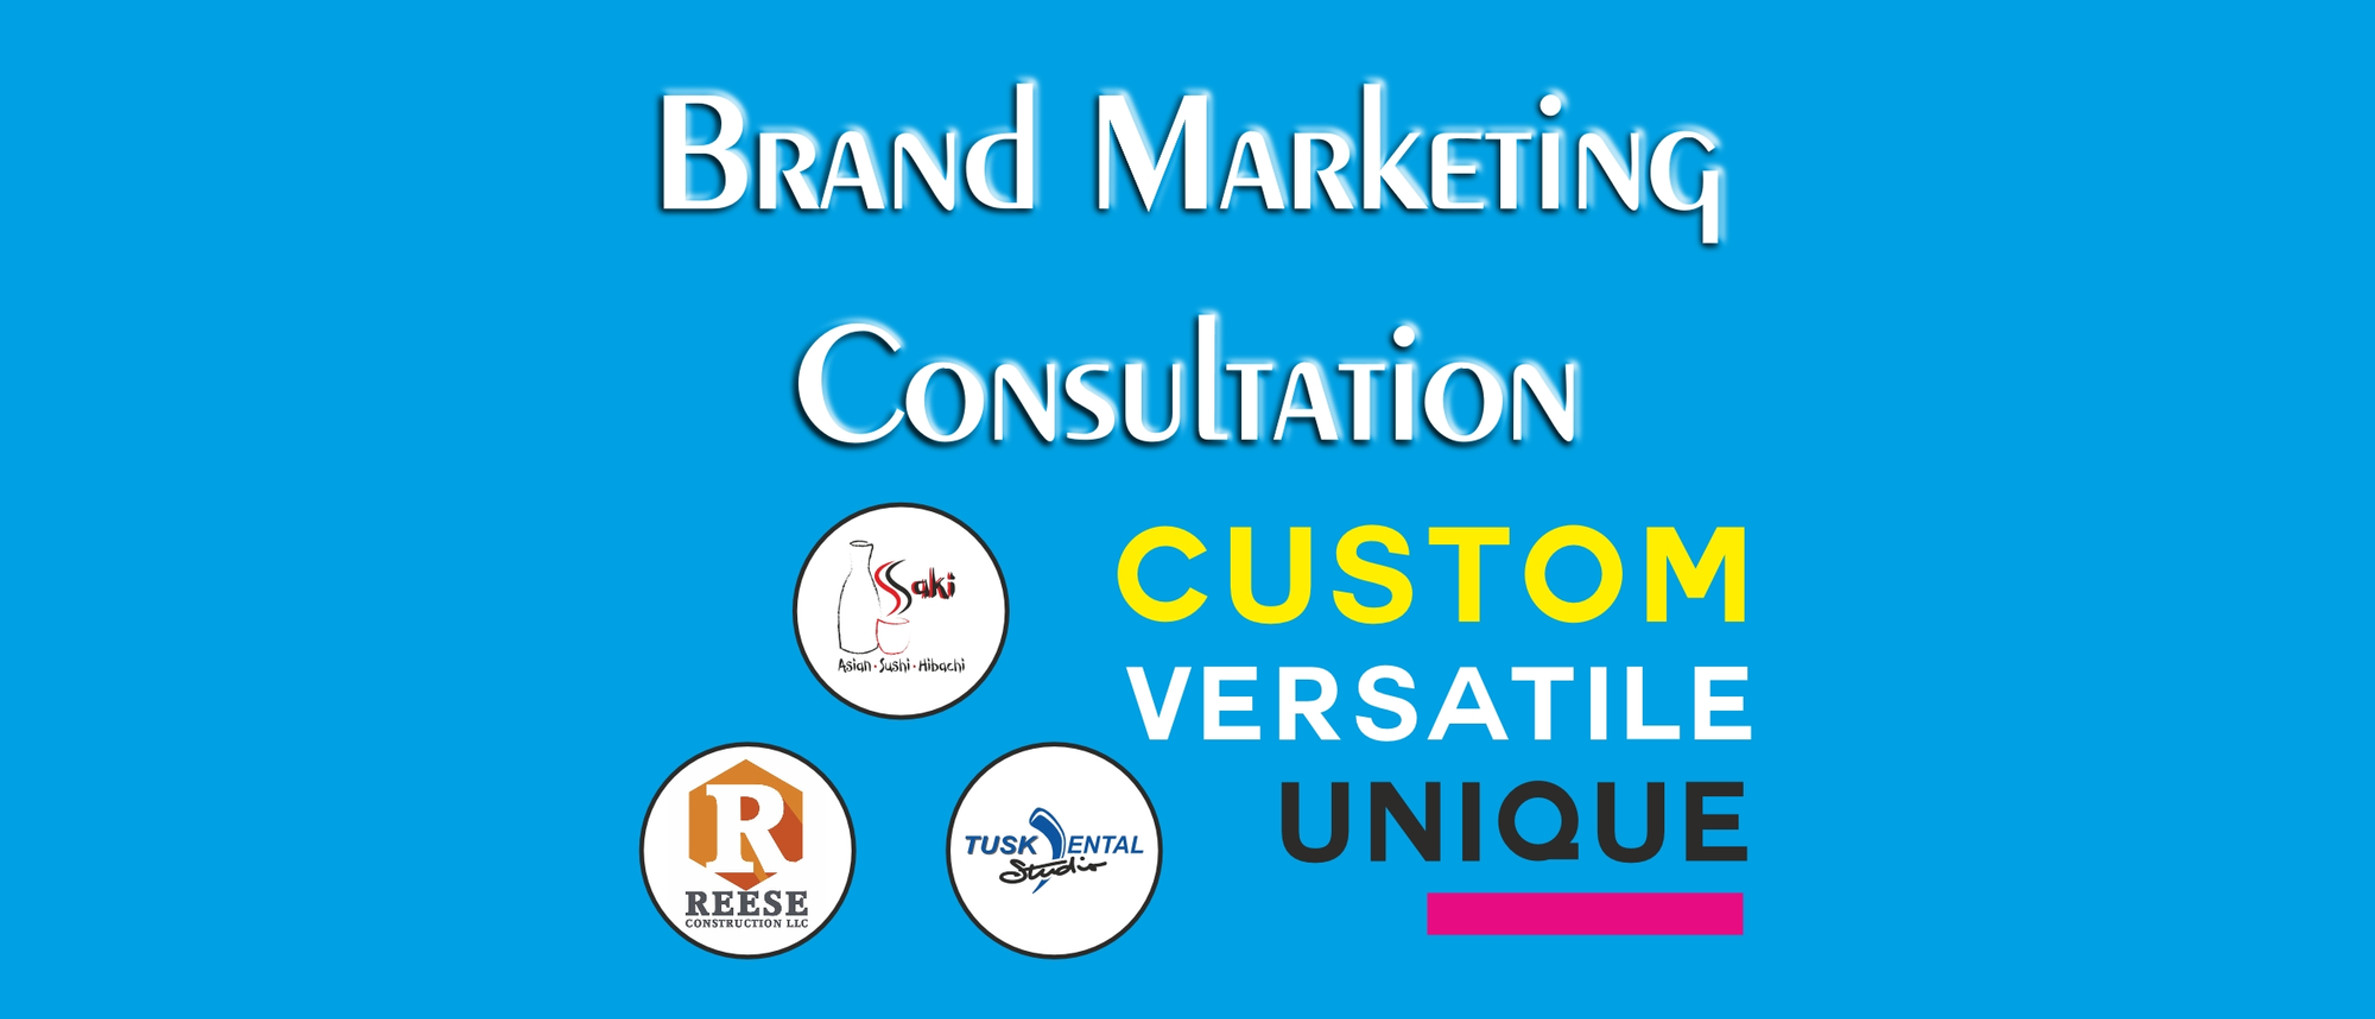 Brand Marketing Consultation